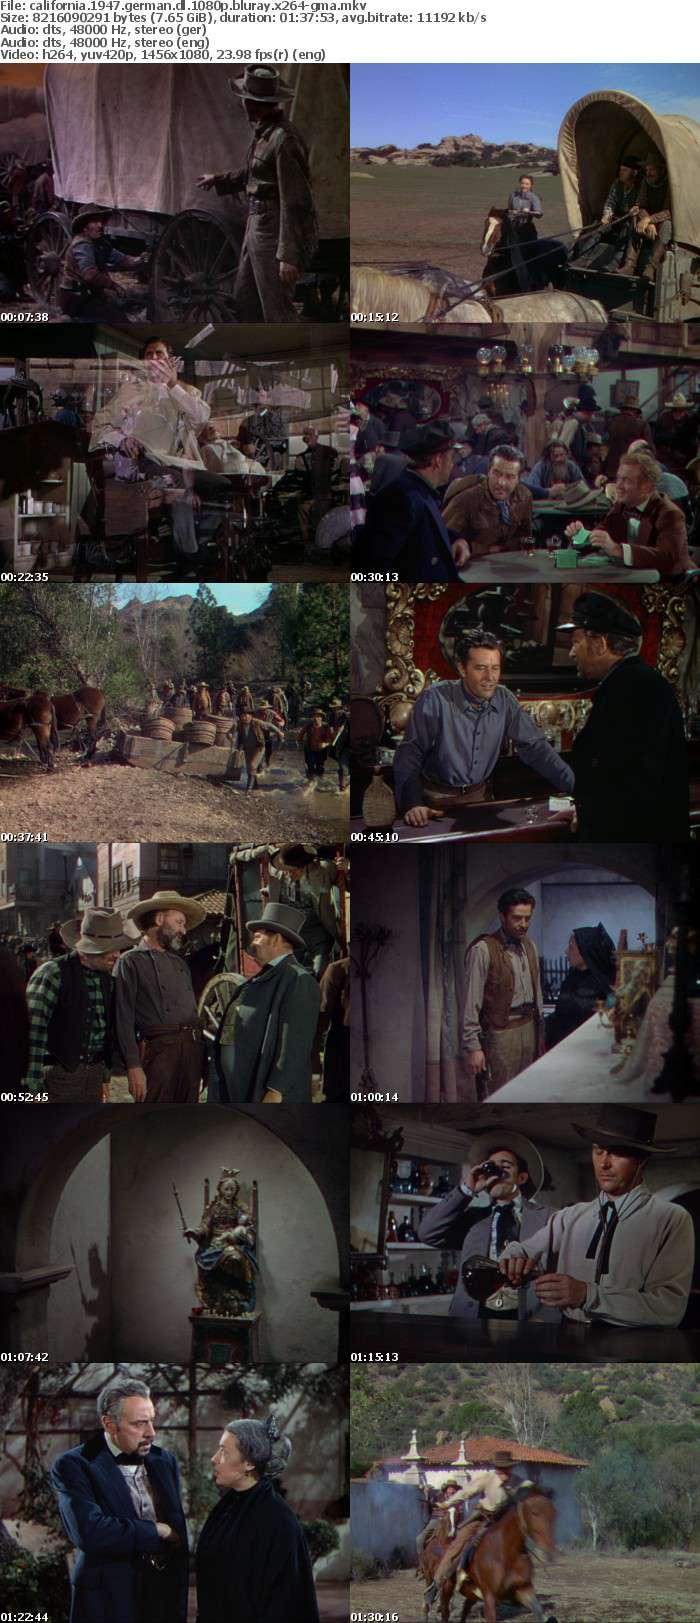 California 1947 German DL 1080p BluRay x264-GMA